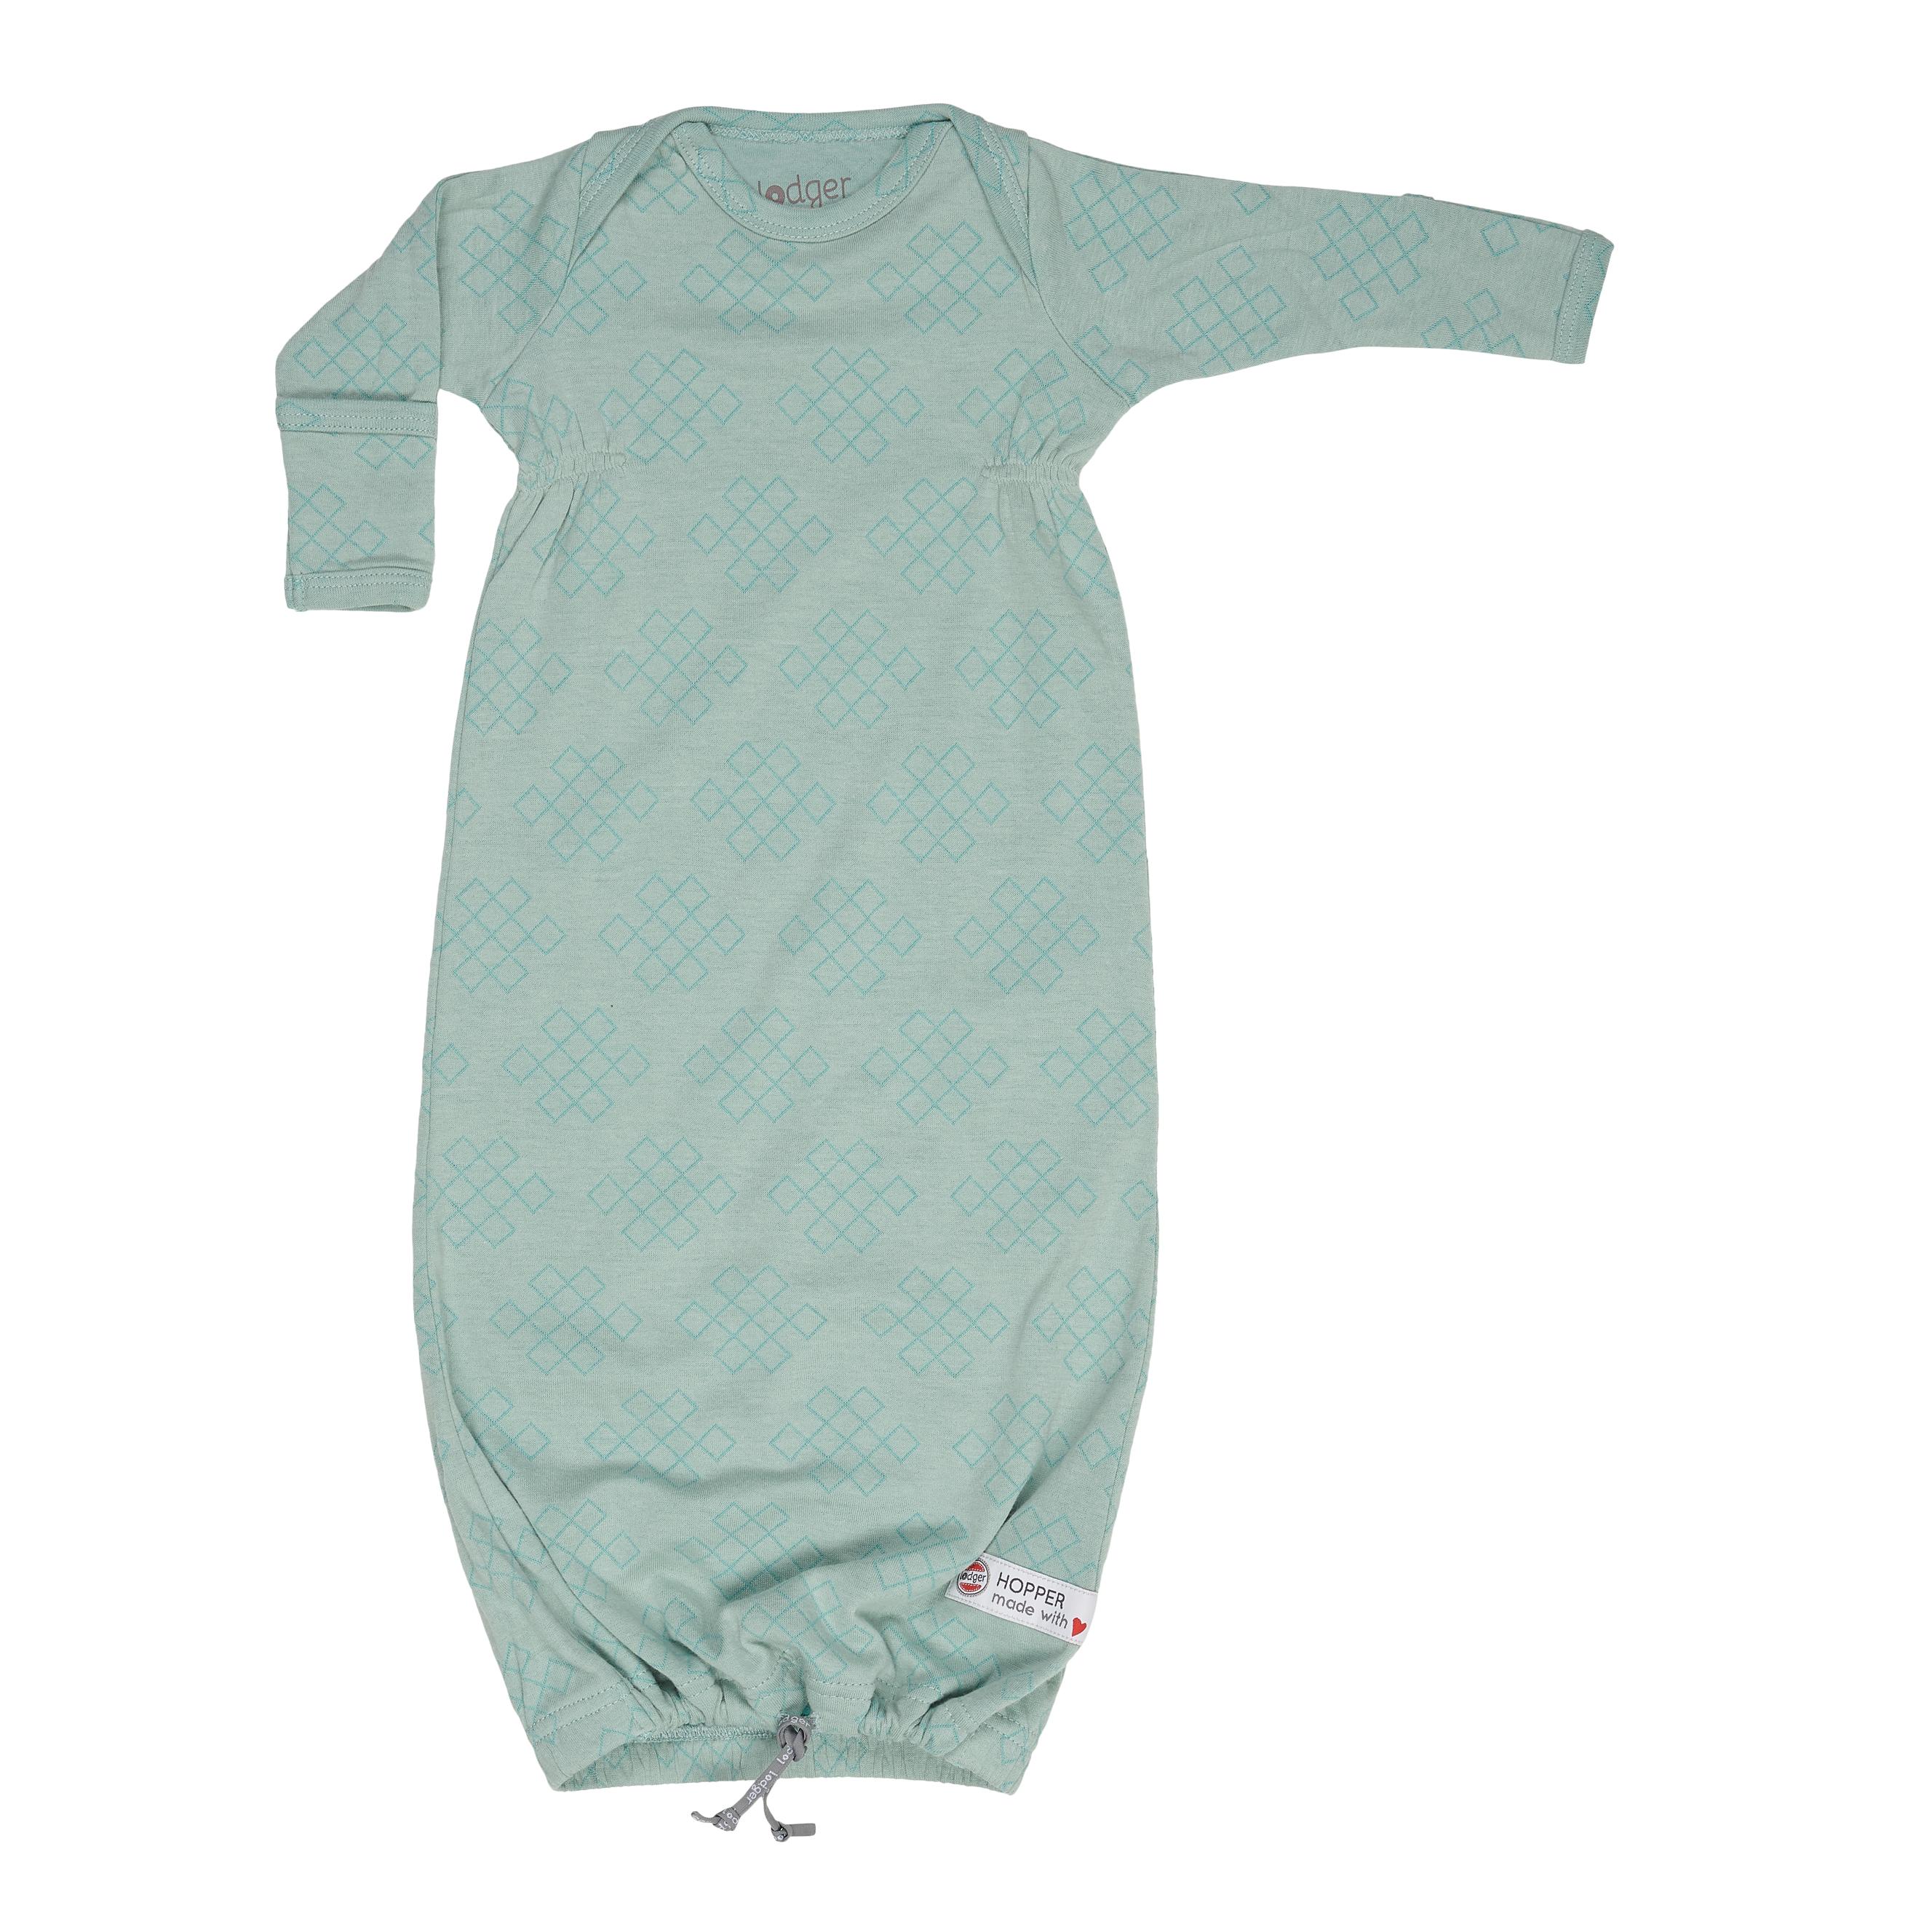 cheaper 2d8fb 95d23 Hopper Newborn Empire sleeping bag for 0-4 months with 0.6 TOG